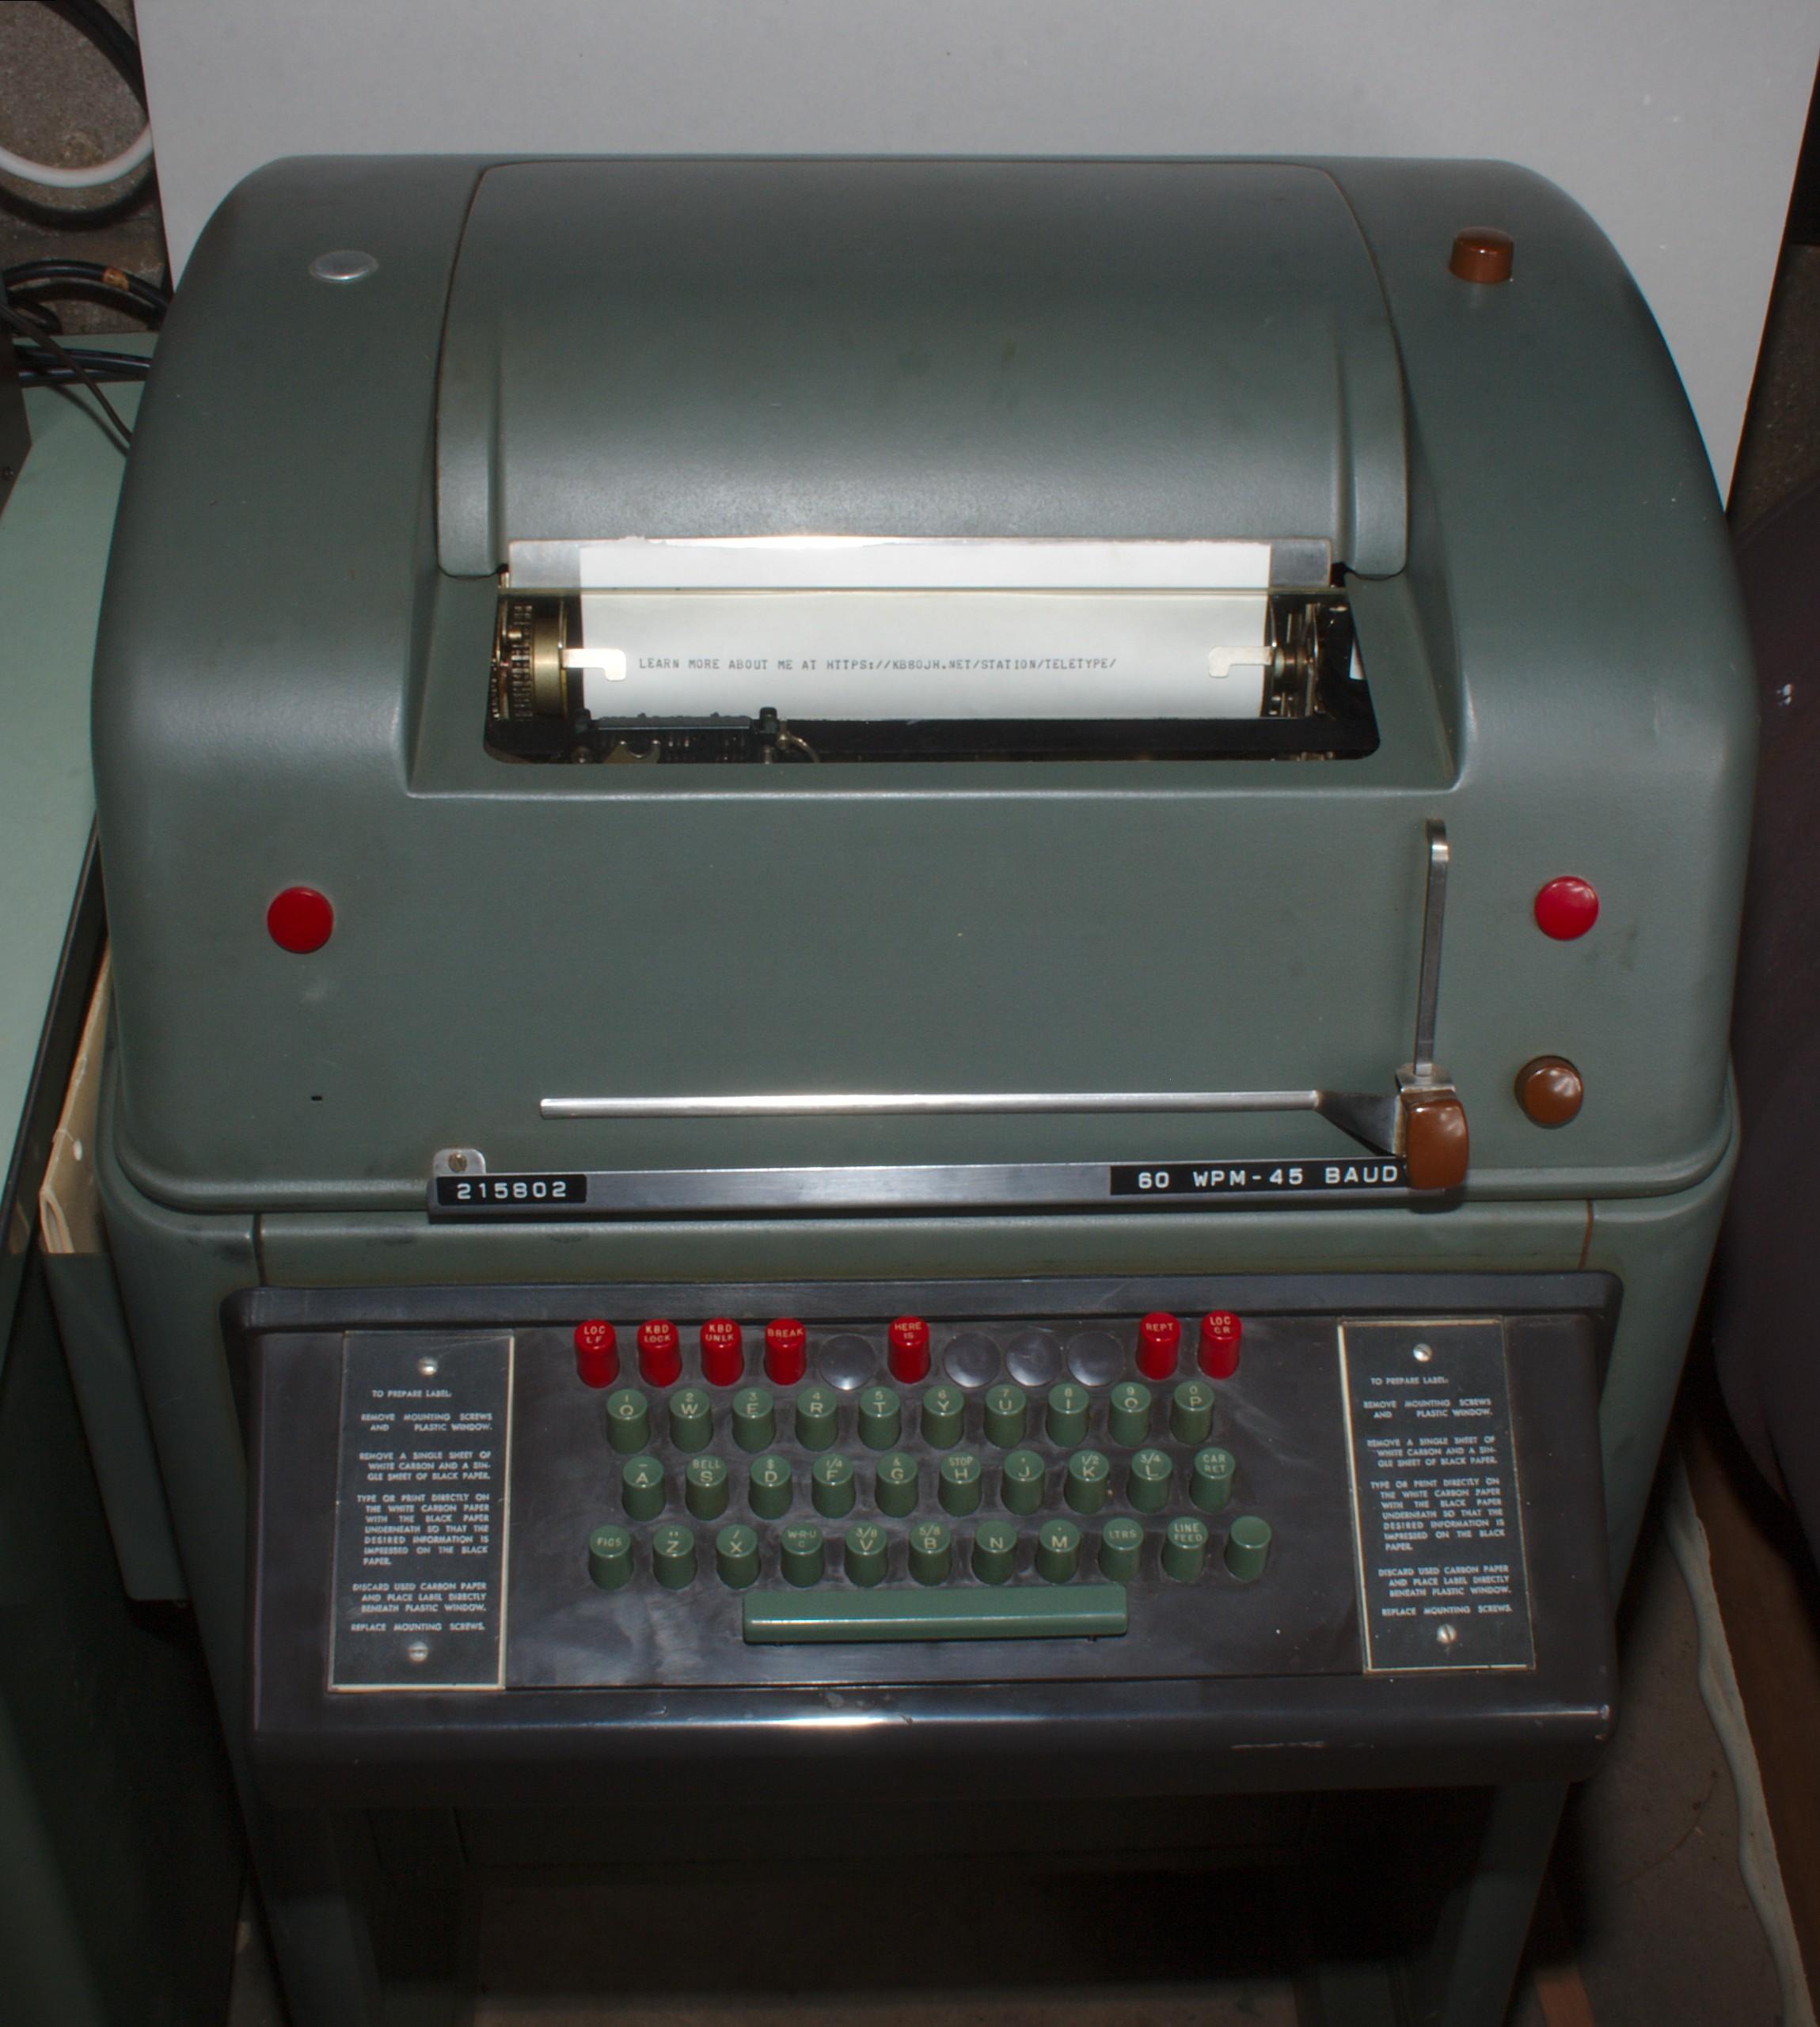 kb8ojh net - Station Information - Teletype